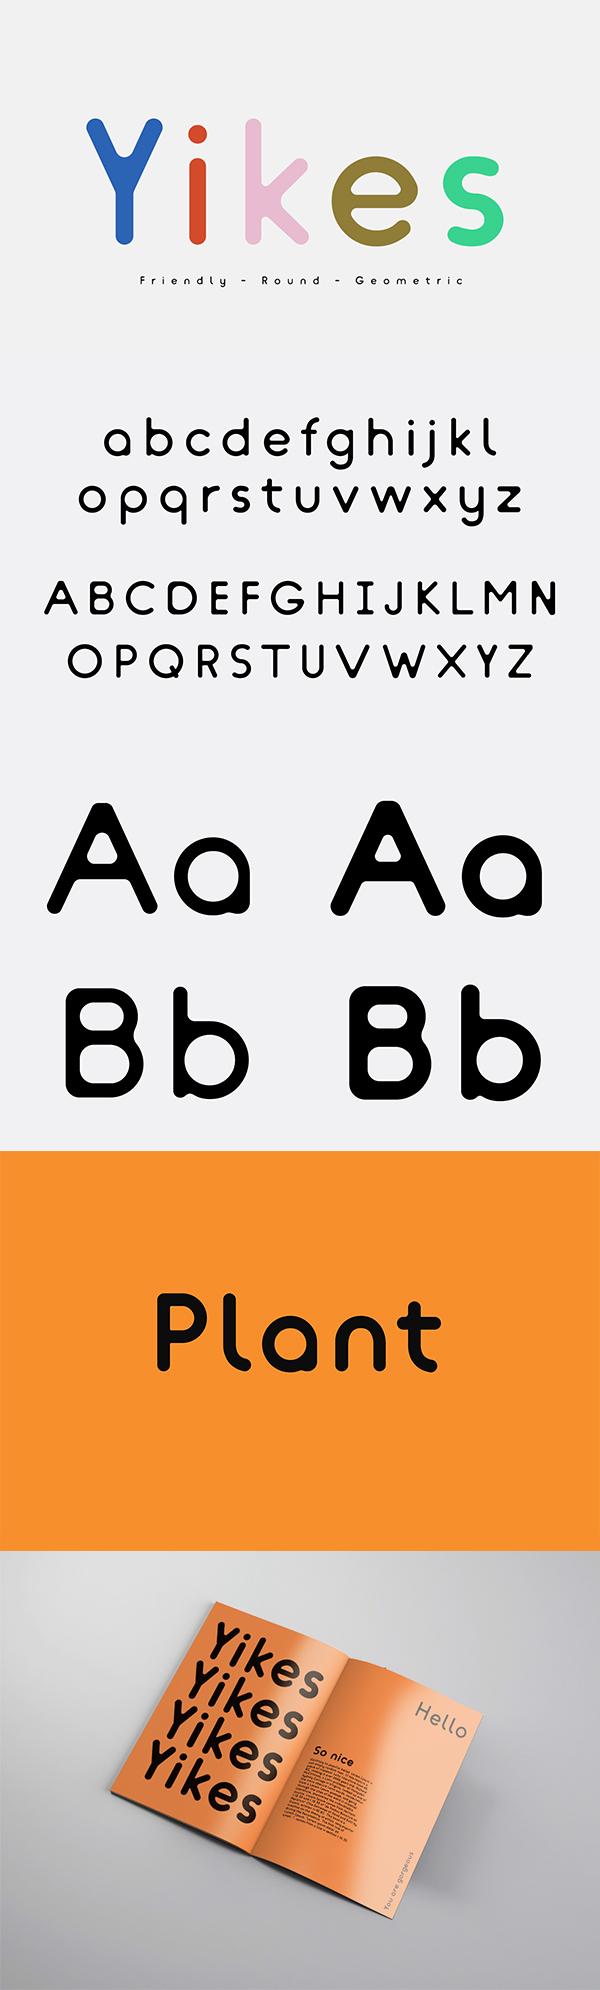 05 Yikes Free Font